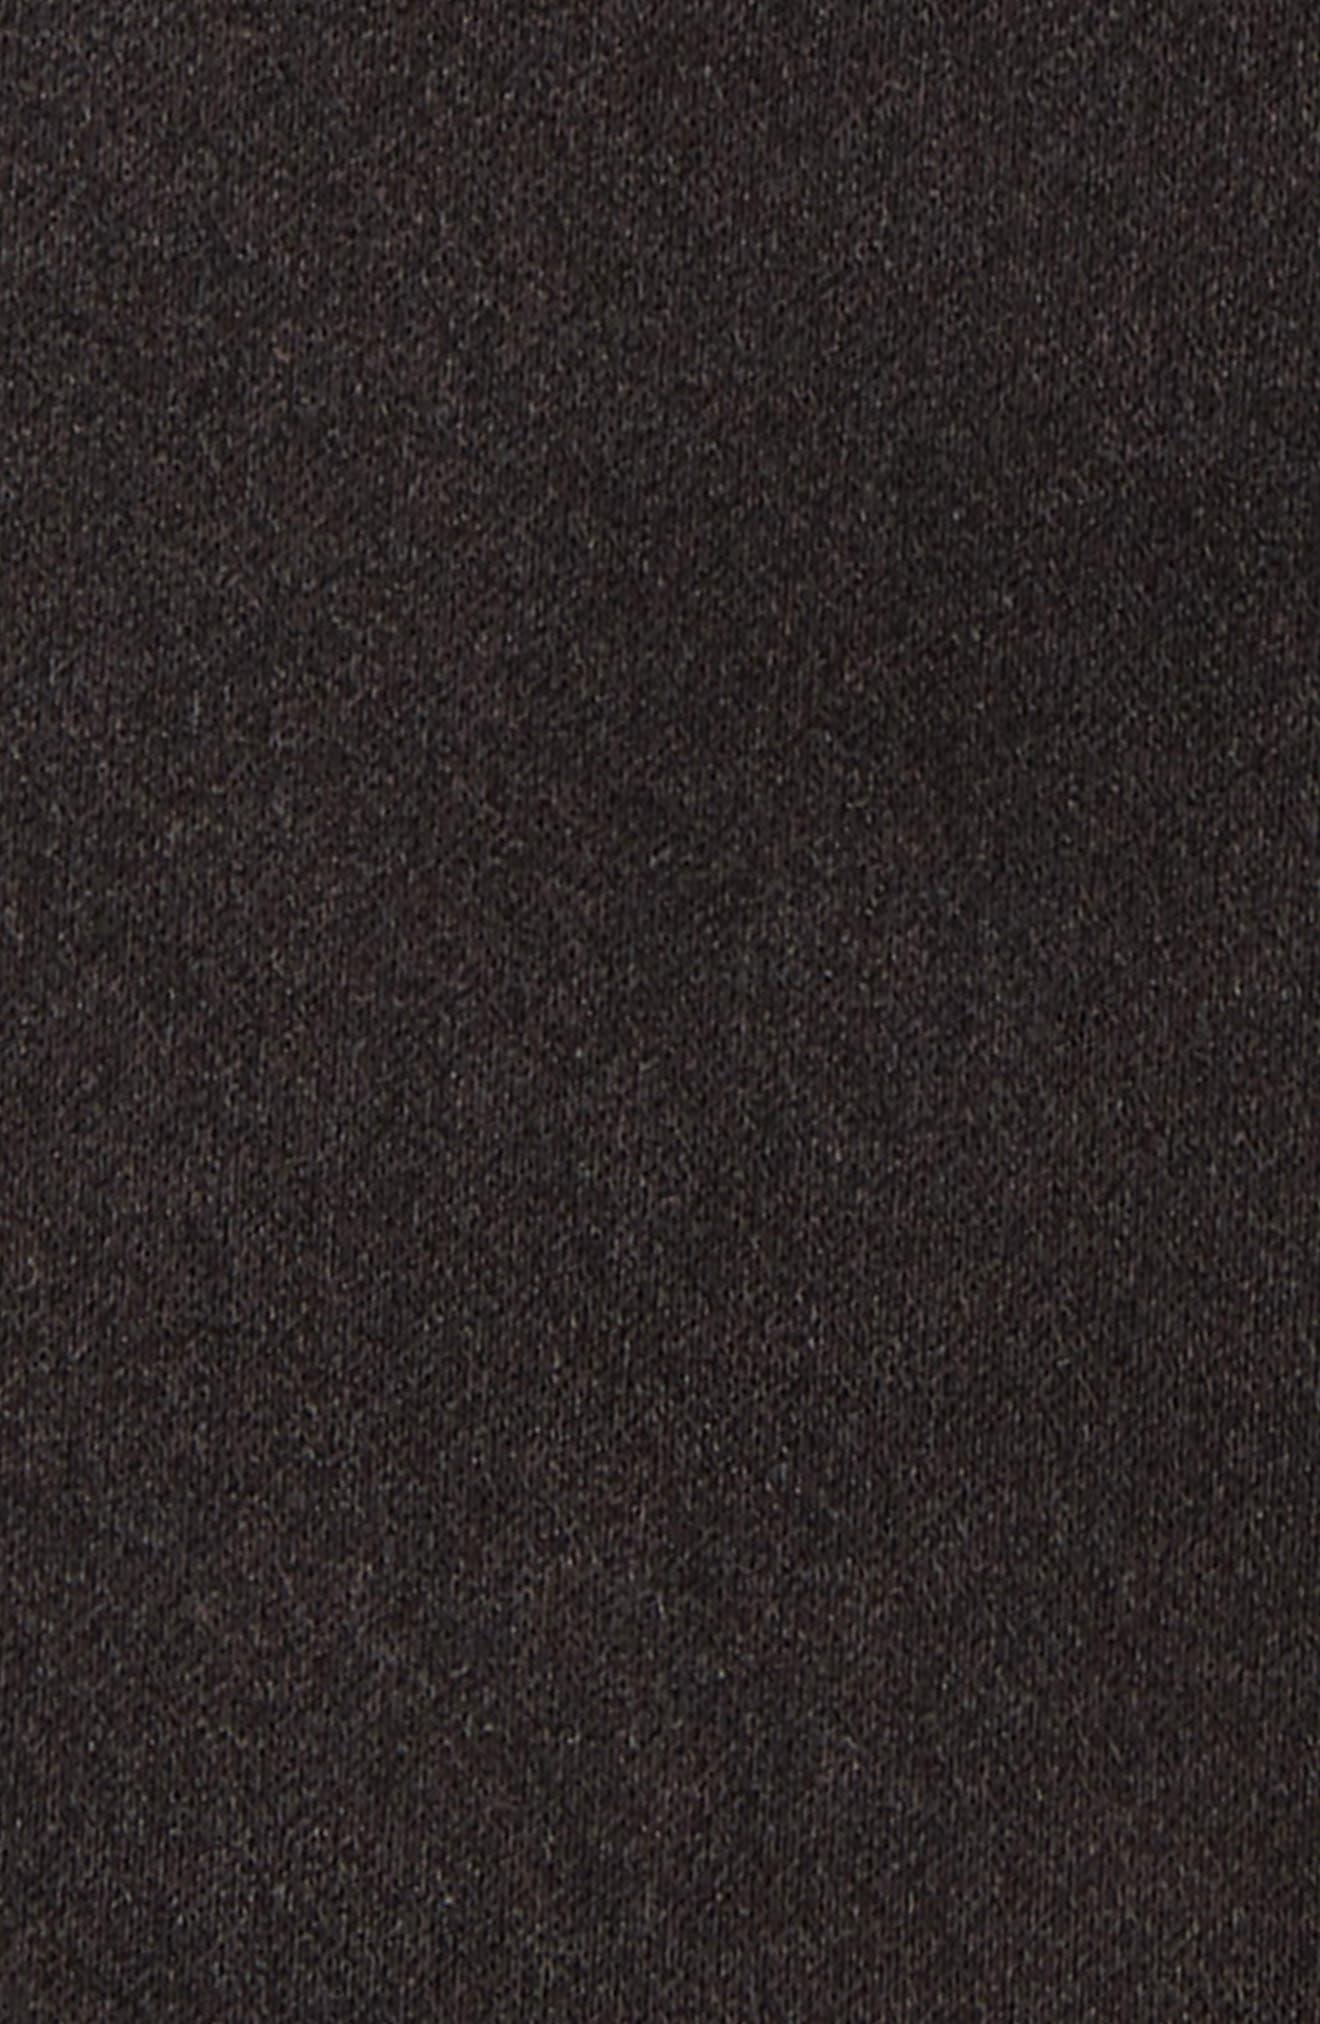 Silk Bow Tie,                             Alternate thumbnail 3, color,                             Black Satin